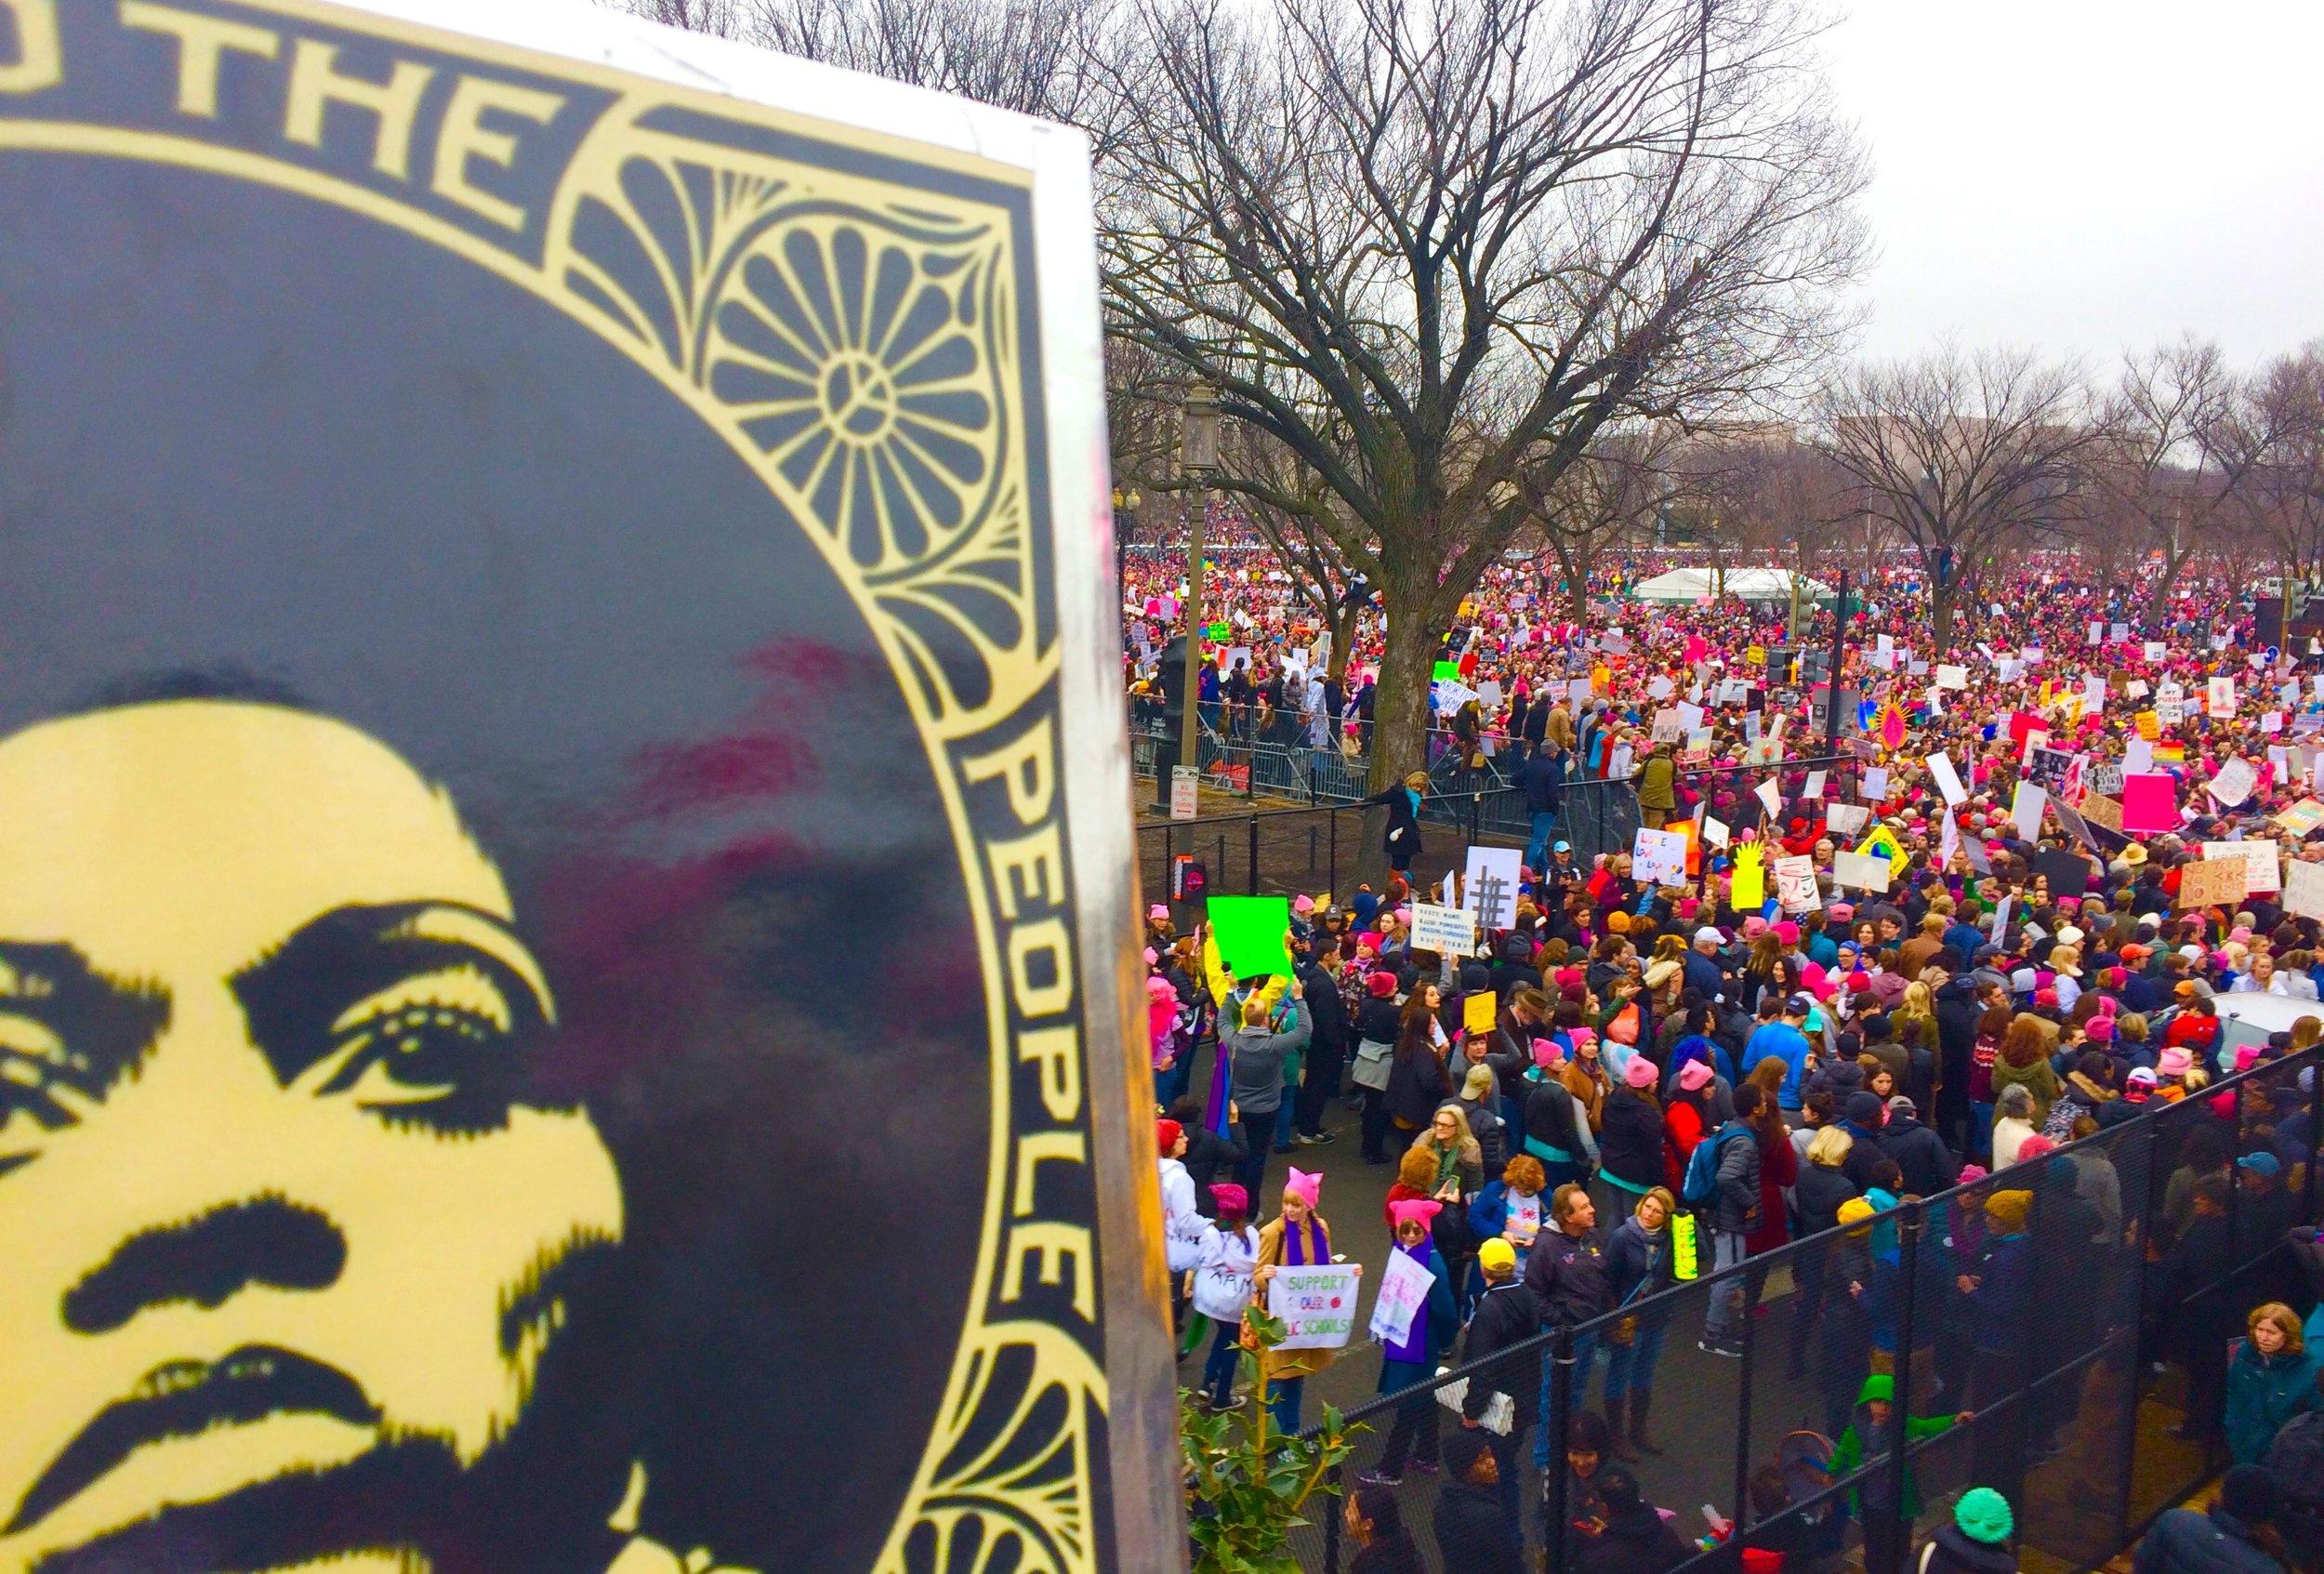 BRCSJ @ Women's March 2 (electric boogaloo).jpg